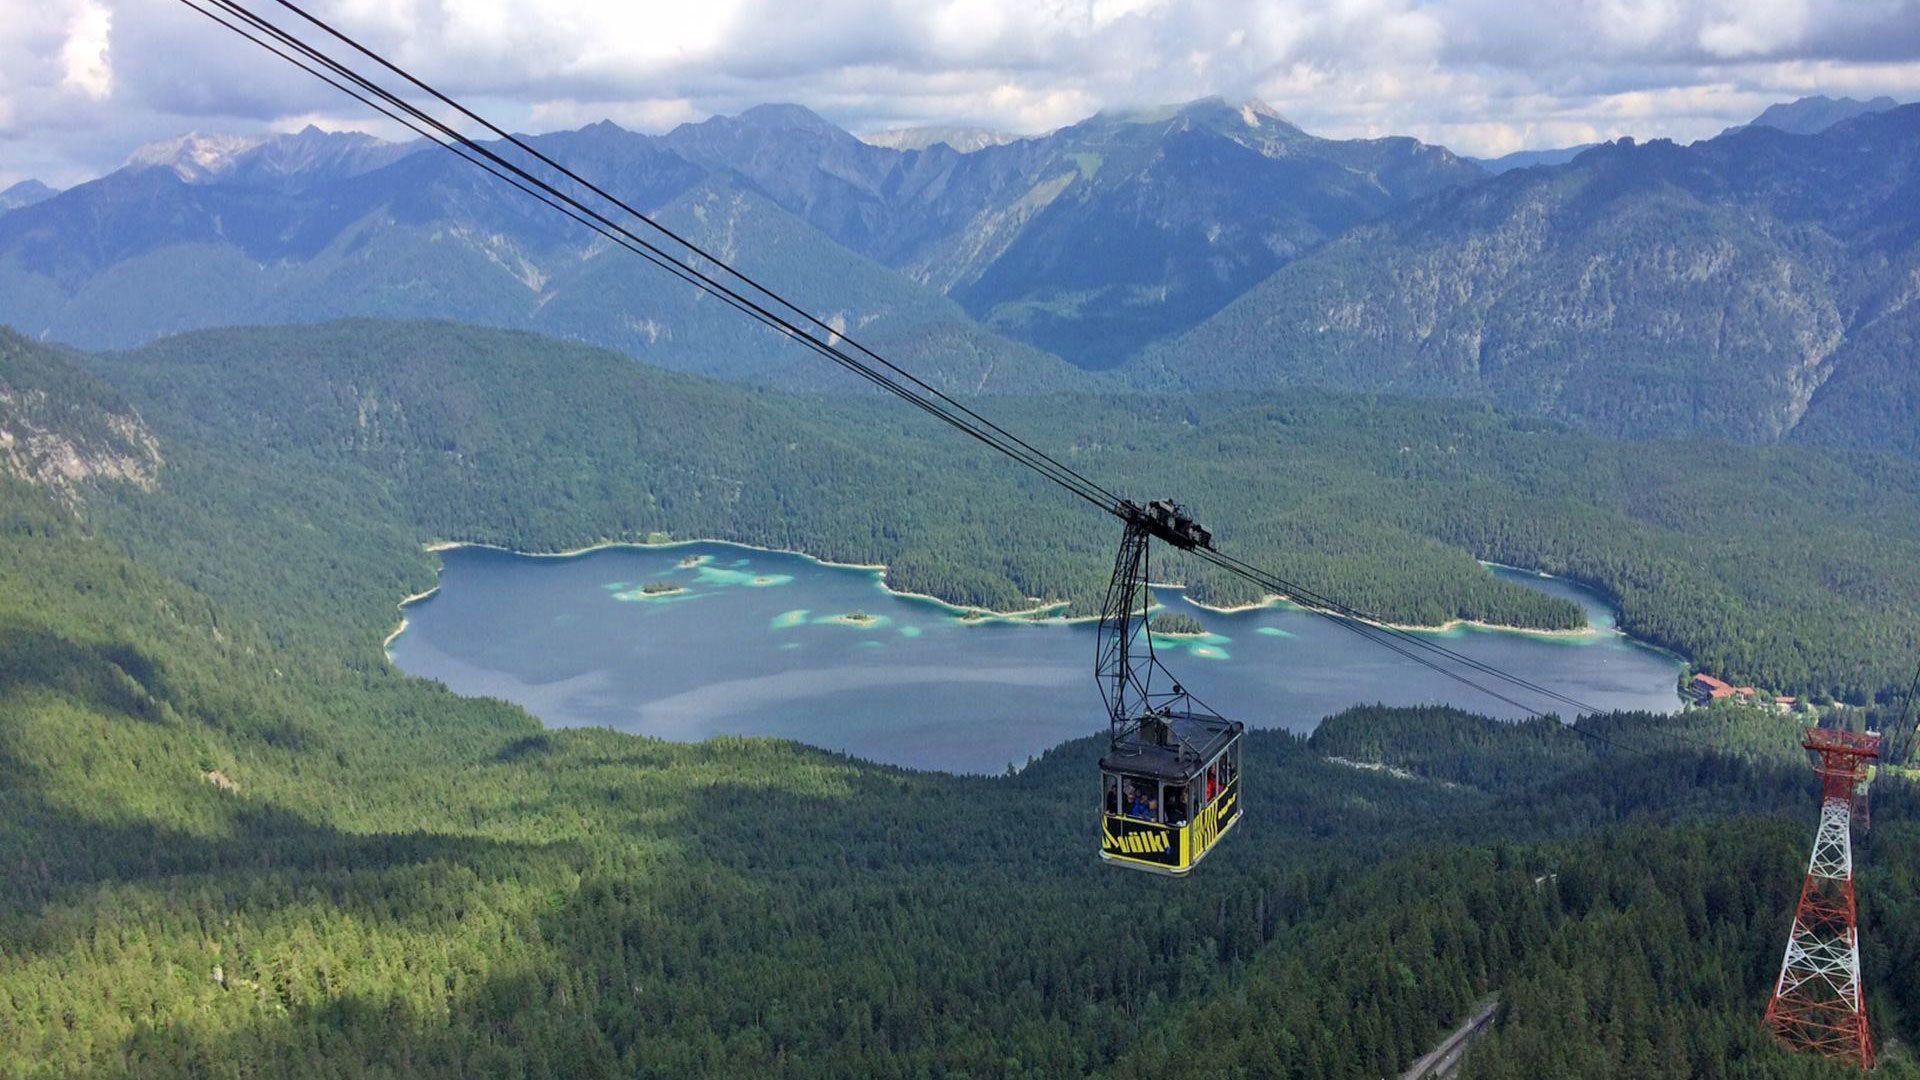 Gondola overlooking the alps in Germany